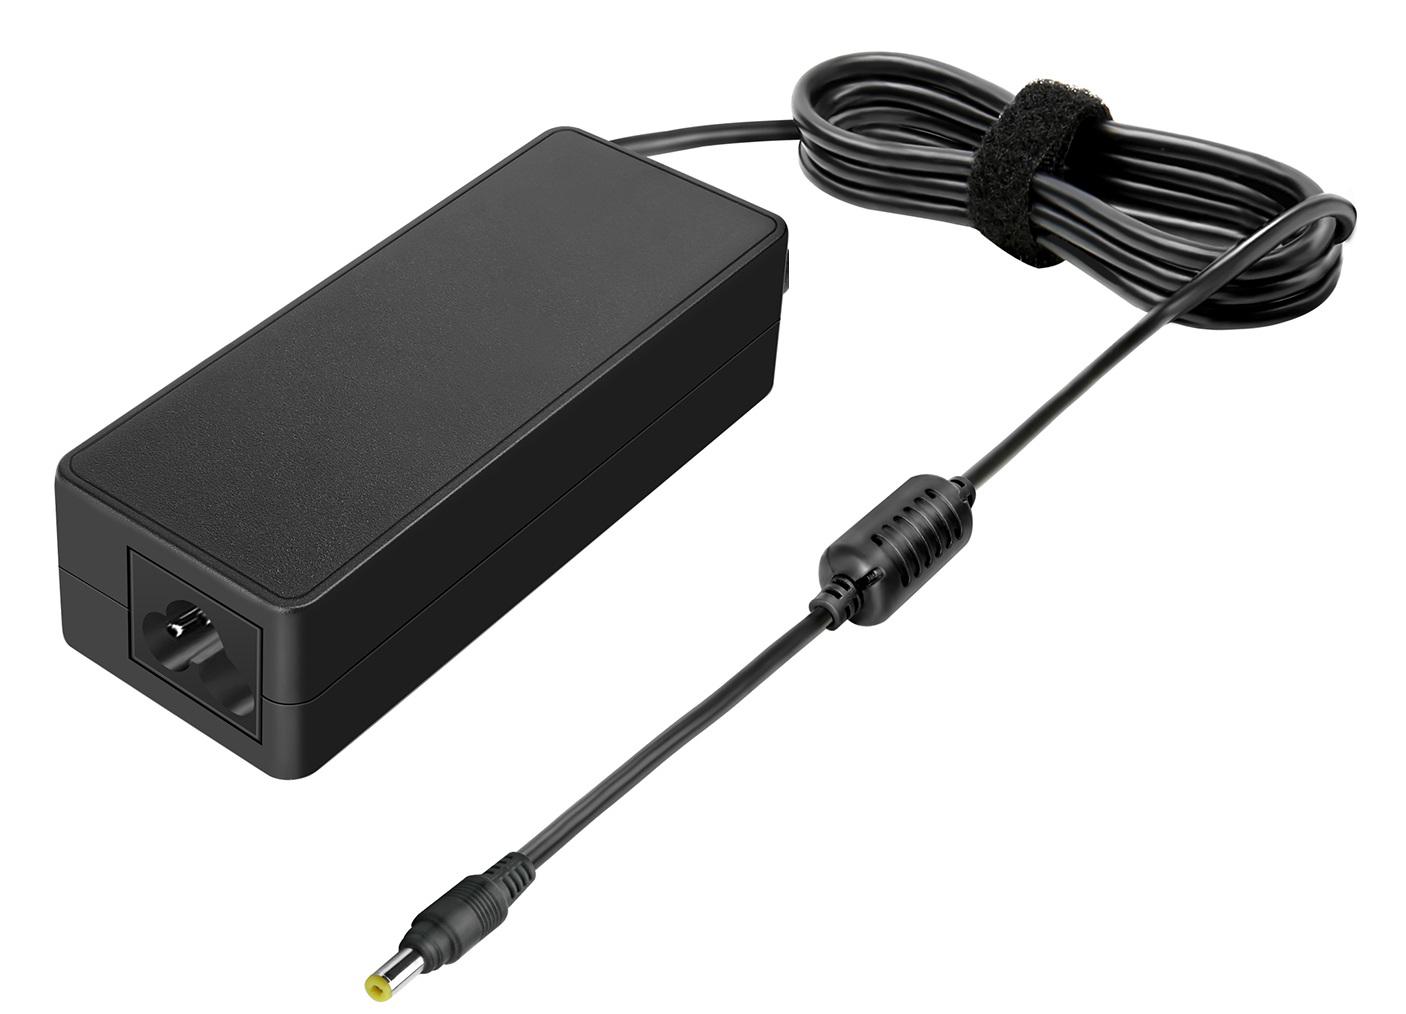 Epzi Power adapter for HP COMPAQ DV6000 DV6800 DV6700 NC6000, 65W, black H651854817